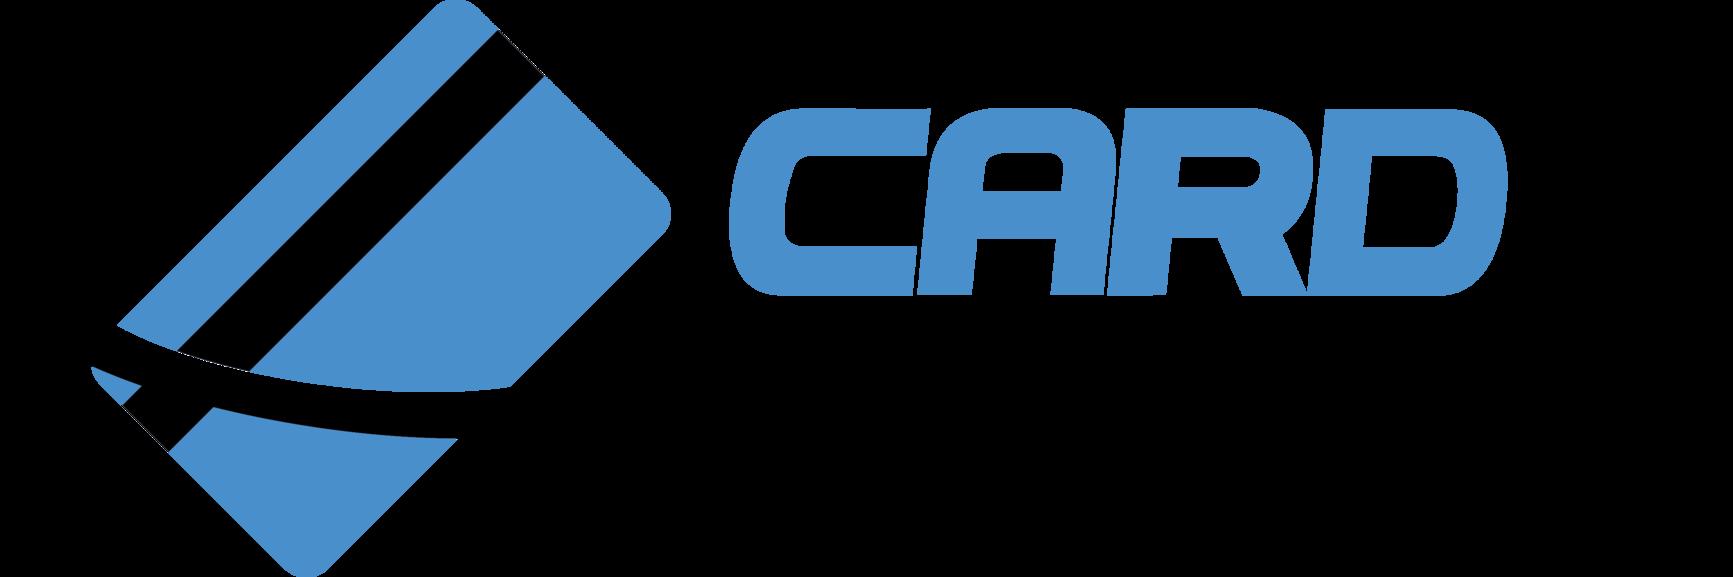 Card Saver logo